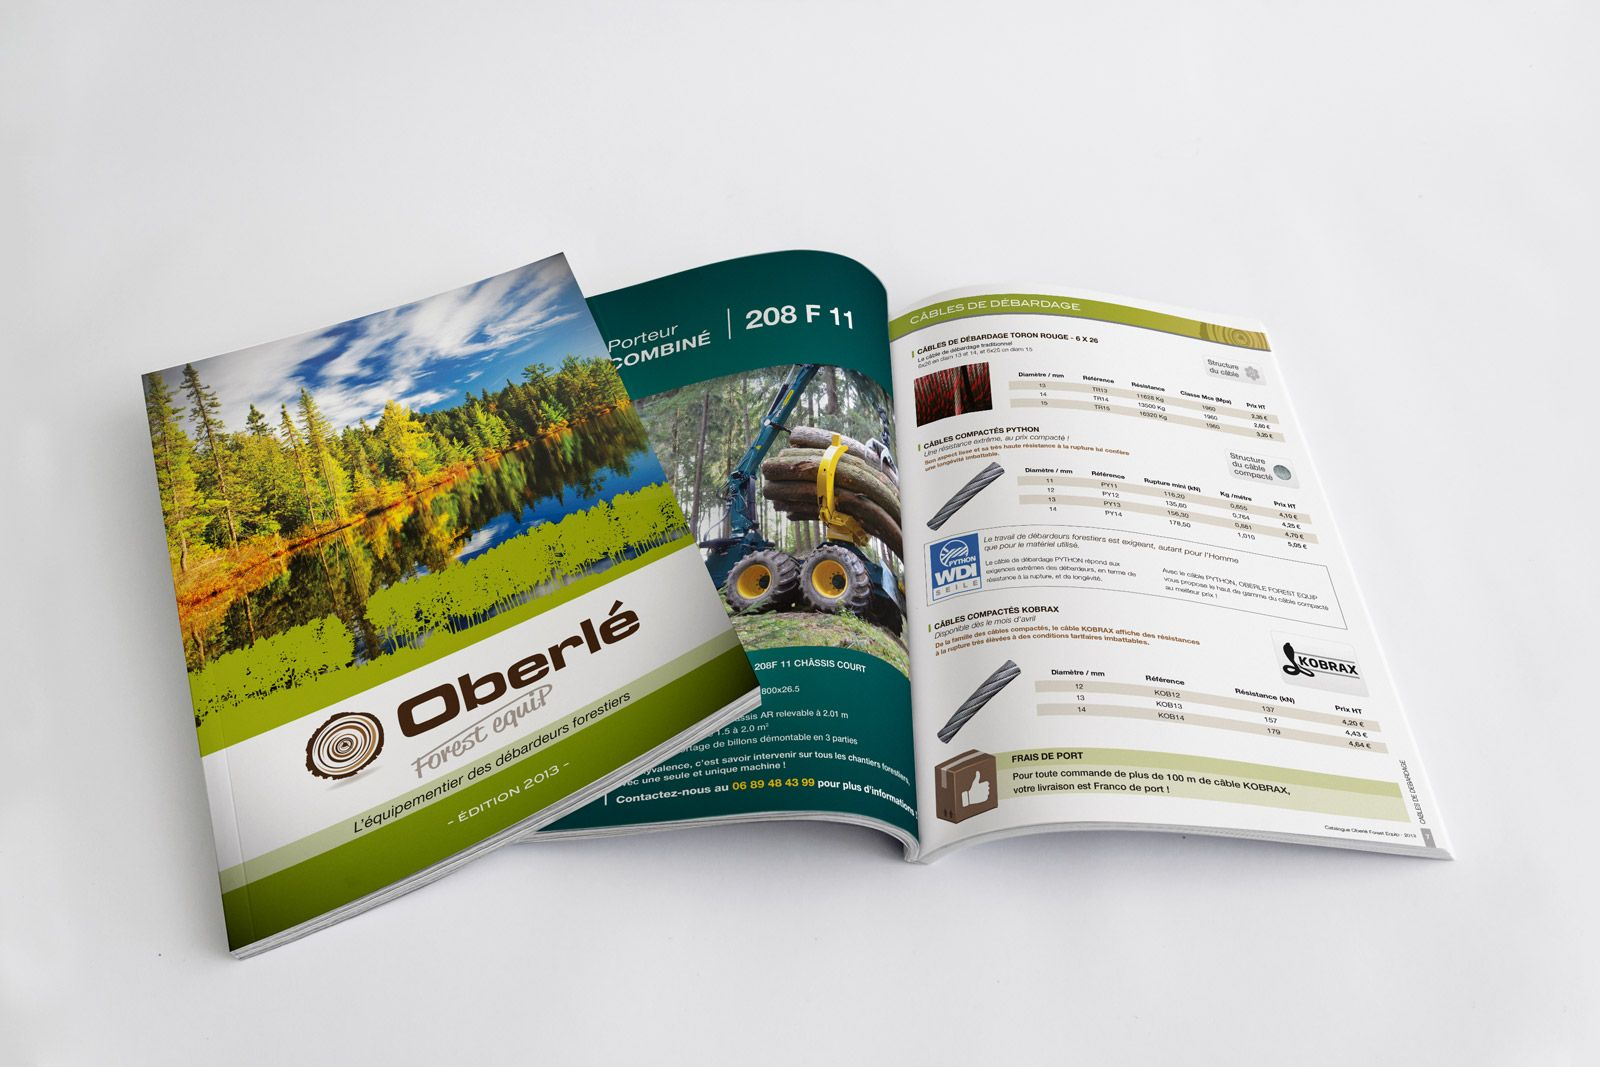 Oberle catalogue 2013